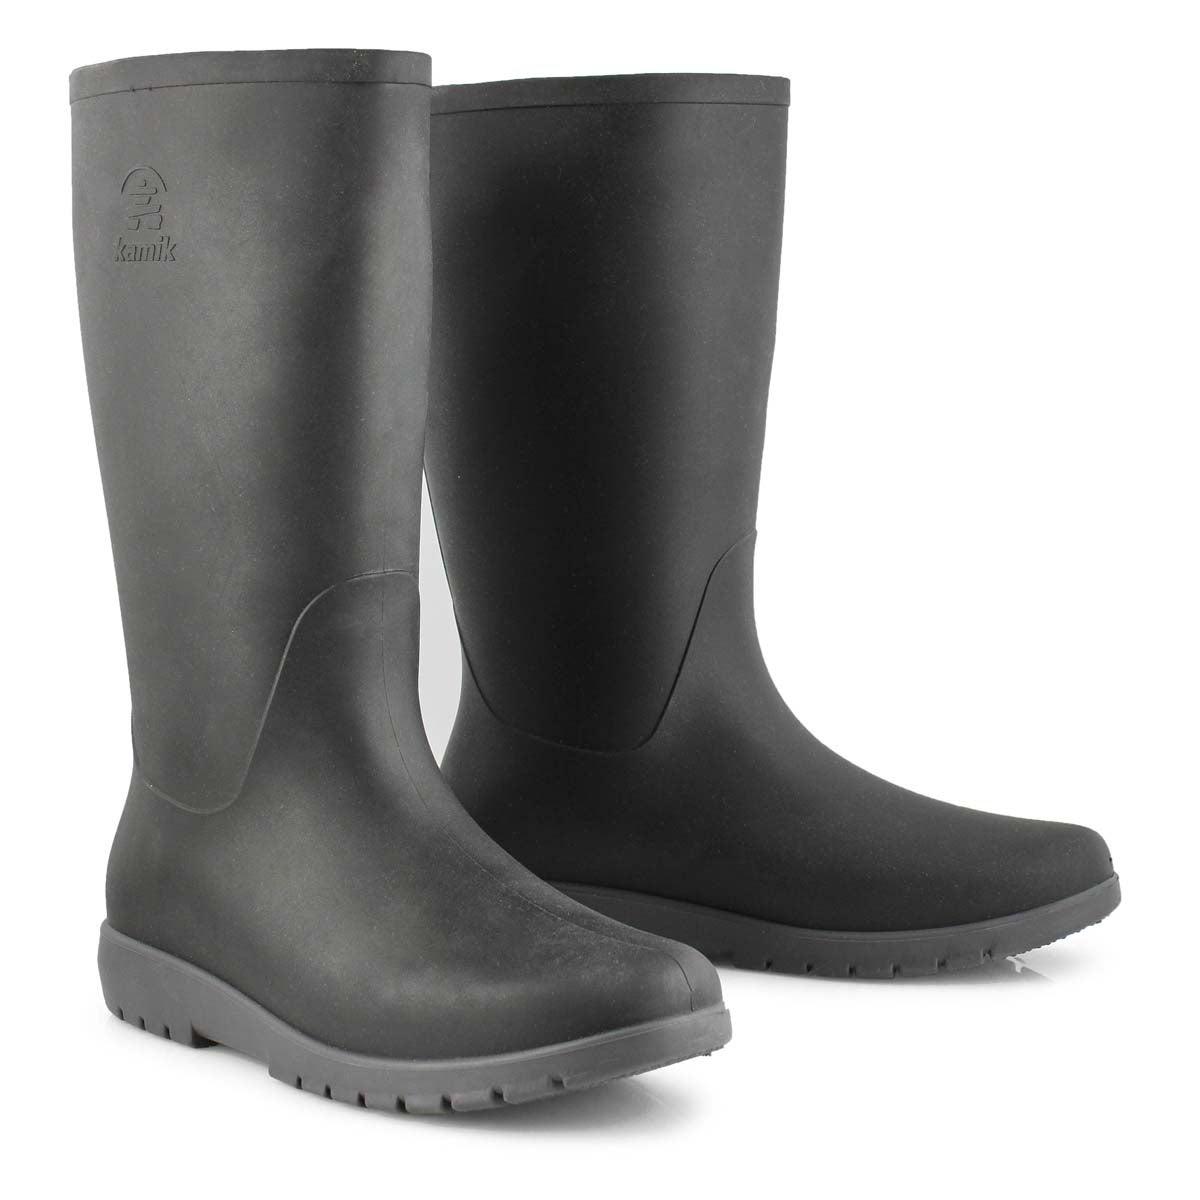 0b52a1d8897 Women's JESSIE blk/char mid waterproof rain boots